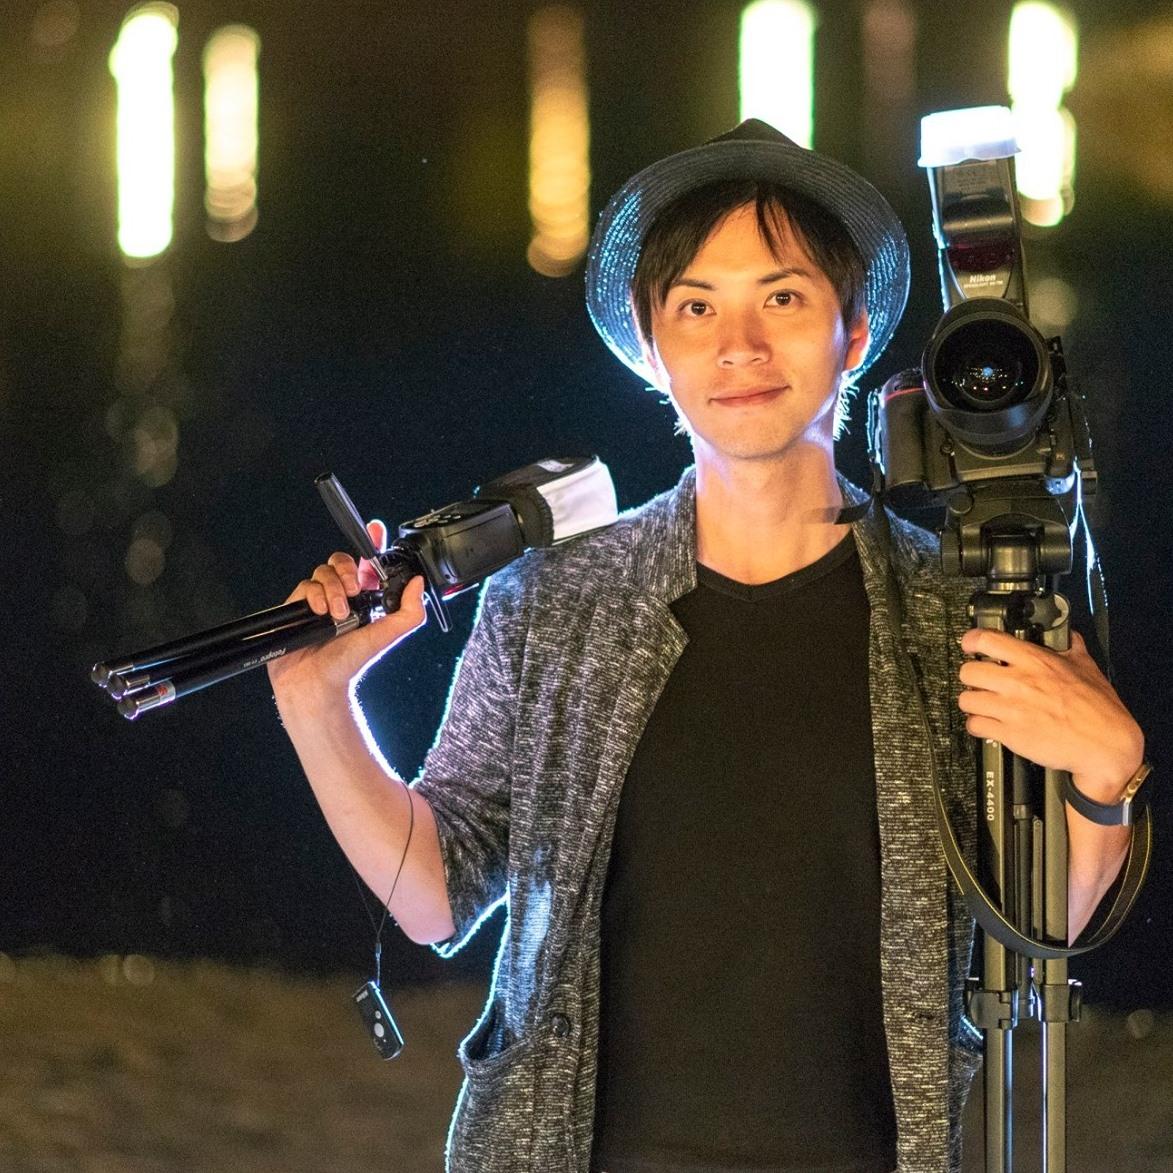 Photographer Paz - 〜 新しい未来に繋げる とっておきのお写真を 〜家族撮影・ウェディング・イベント撮影など出張カメラマンとして活躍している傍ら、創業予定の方に写真からアドバイス!カメラ初心者講座も運営中♪